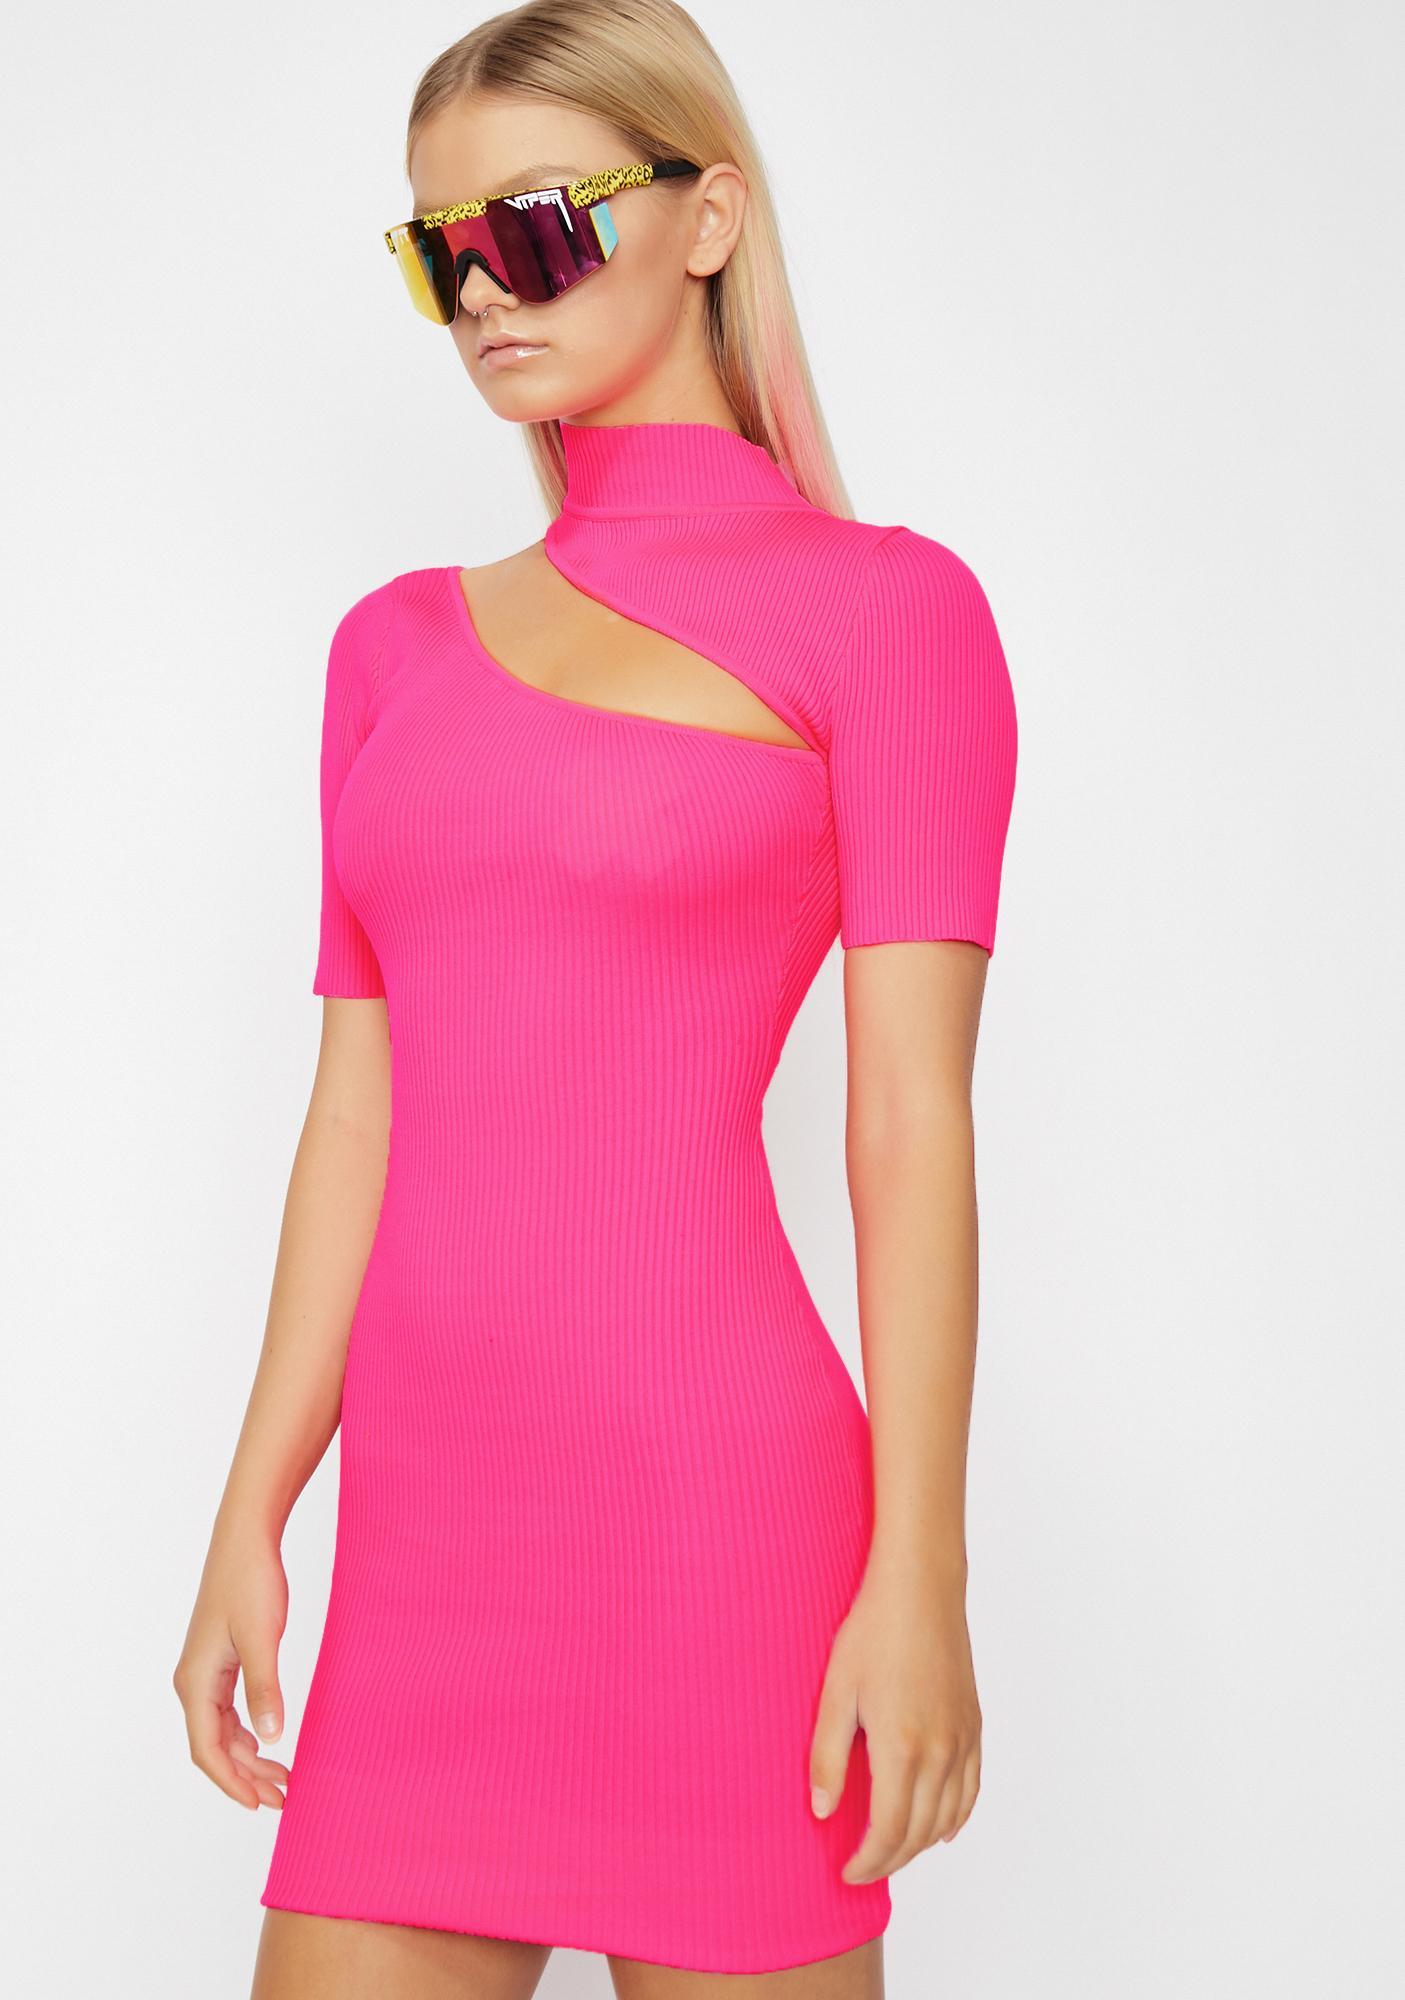 BB Girls Wanna Have Fun Mini Dress